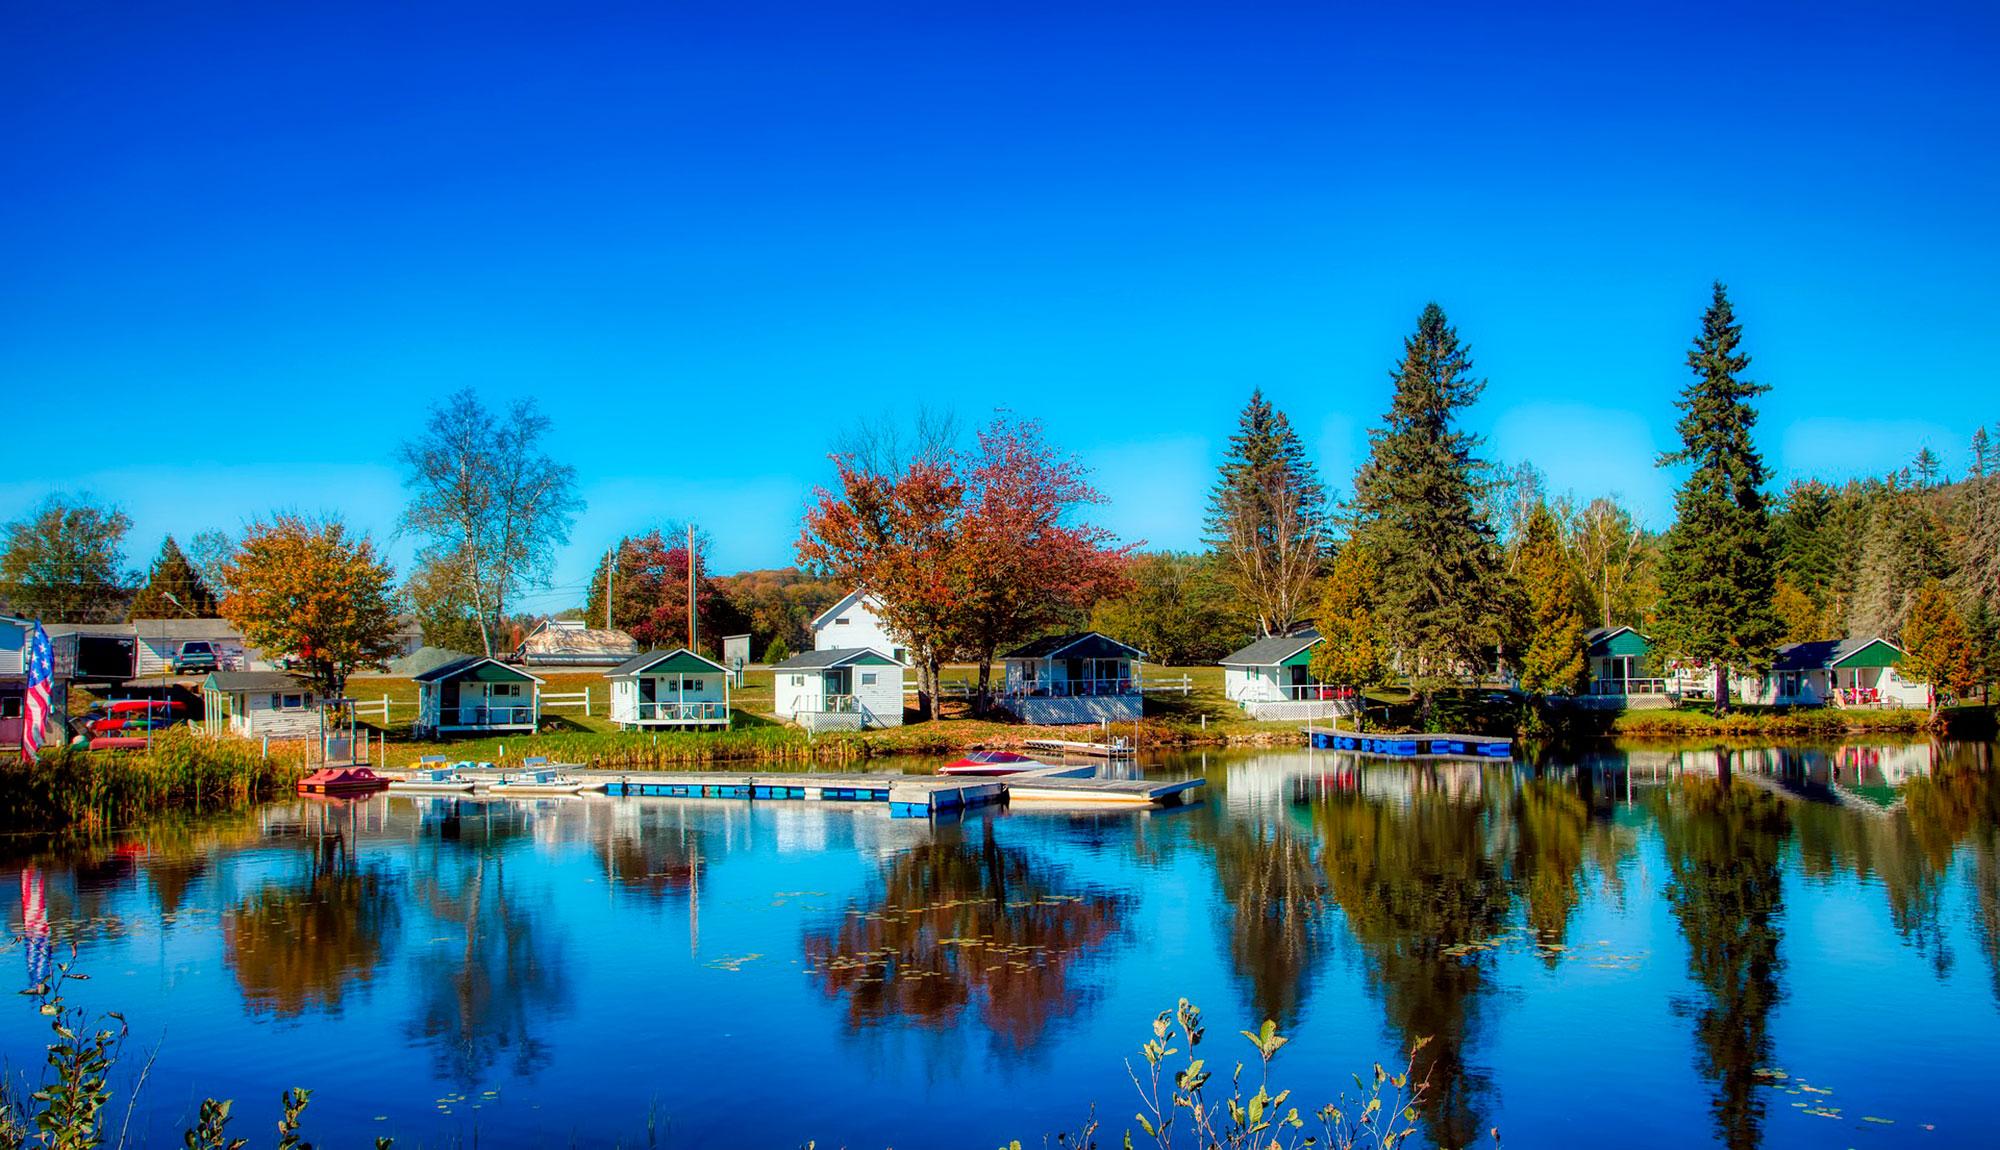 Costa Este: Paisajes de Nueva Inglaterra - EEUU- imagen #4